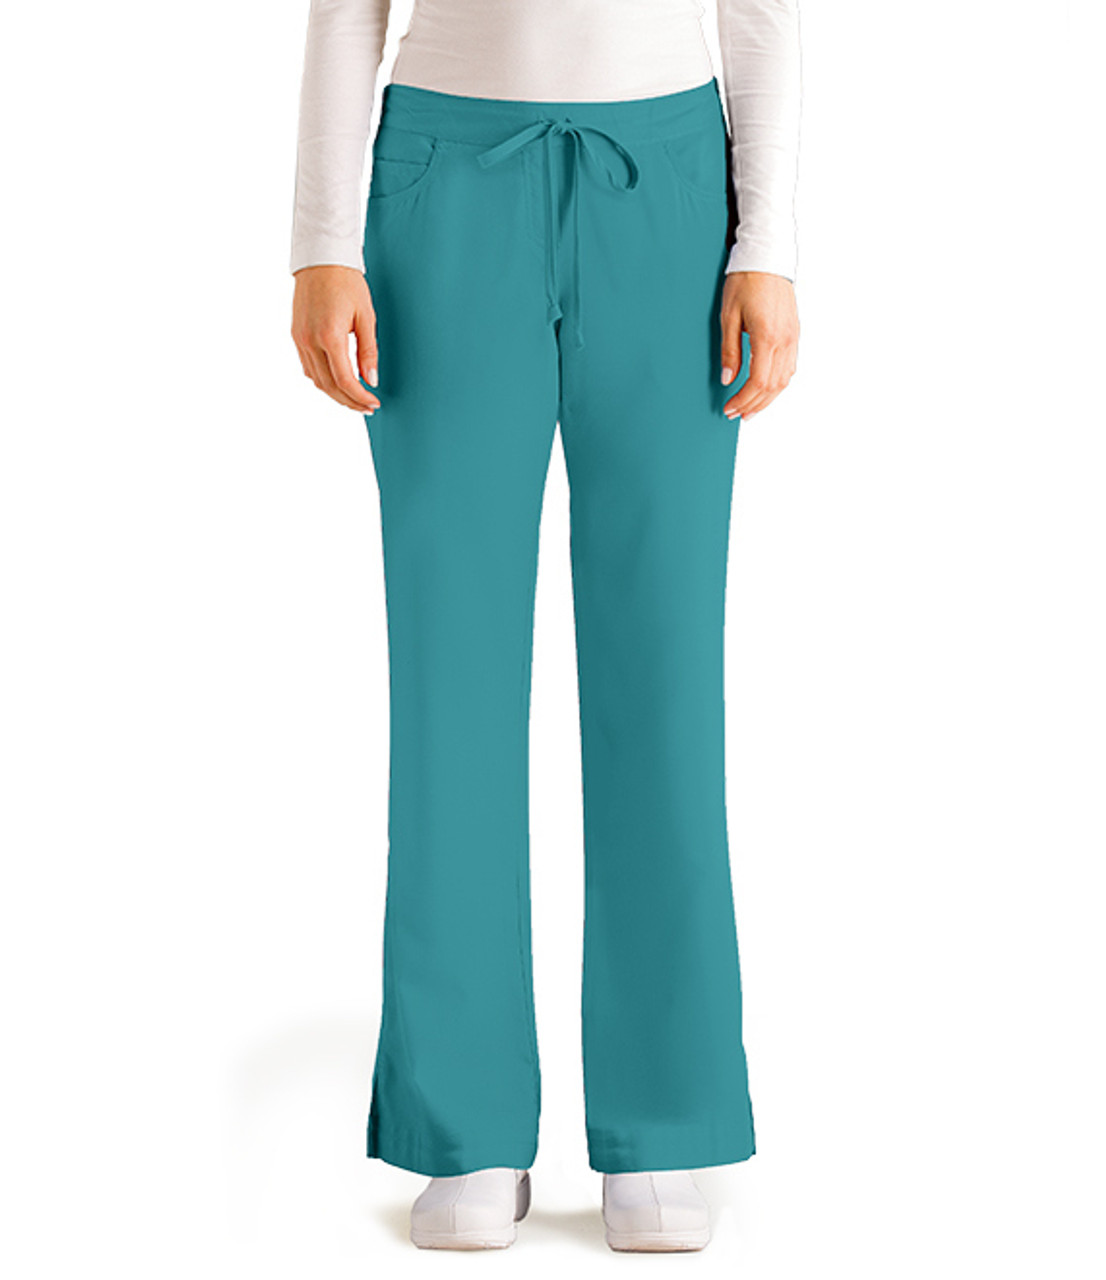 (4232) Grey's Anatomy 5 Pocket Drawstring Pant